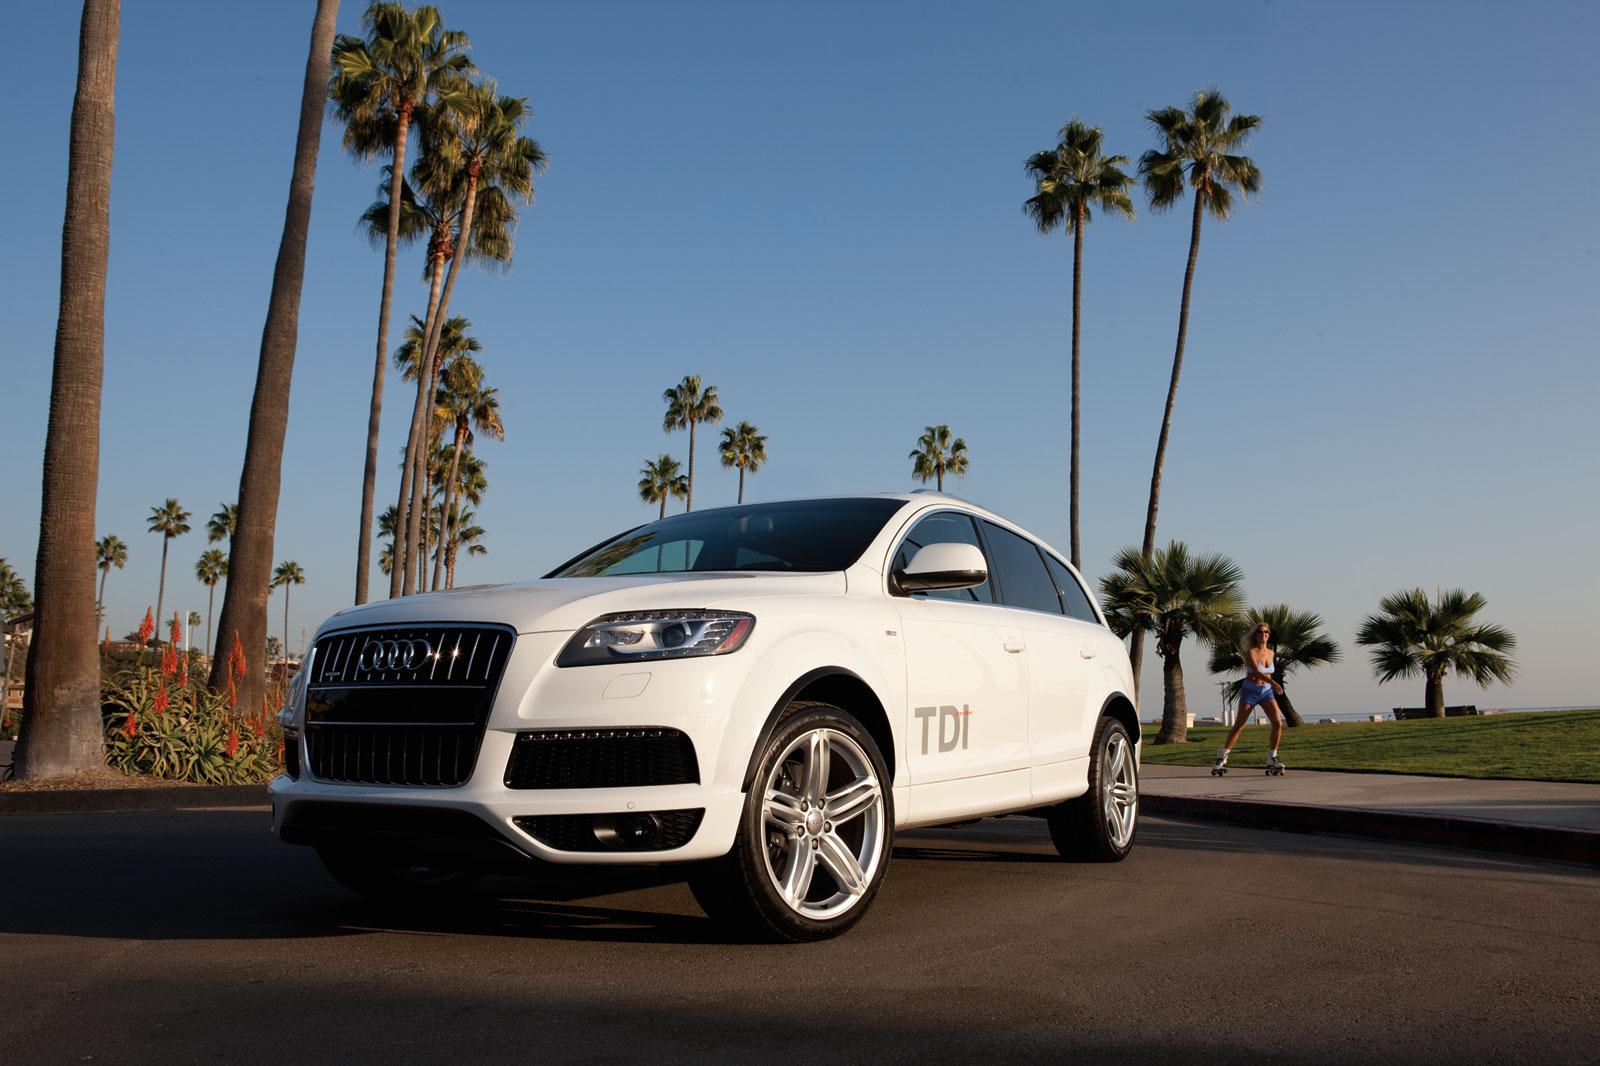 http://2.bp.blogspot.com/-8DBw5PEcPEg/T-CgOClyTTI/AAAAAAAADo4/AiBHwCUyPeM/s1600/Audi+Q7+3.0+TDI+S+line+hd+Wallpapers+2011_1.jpg